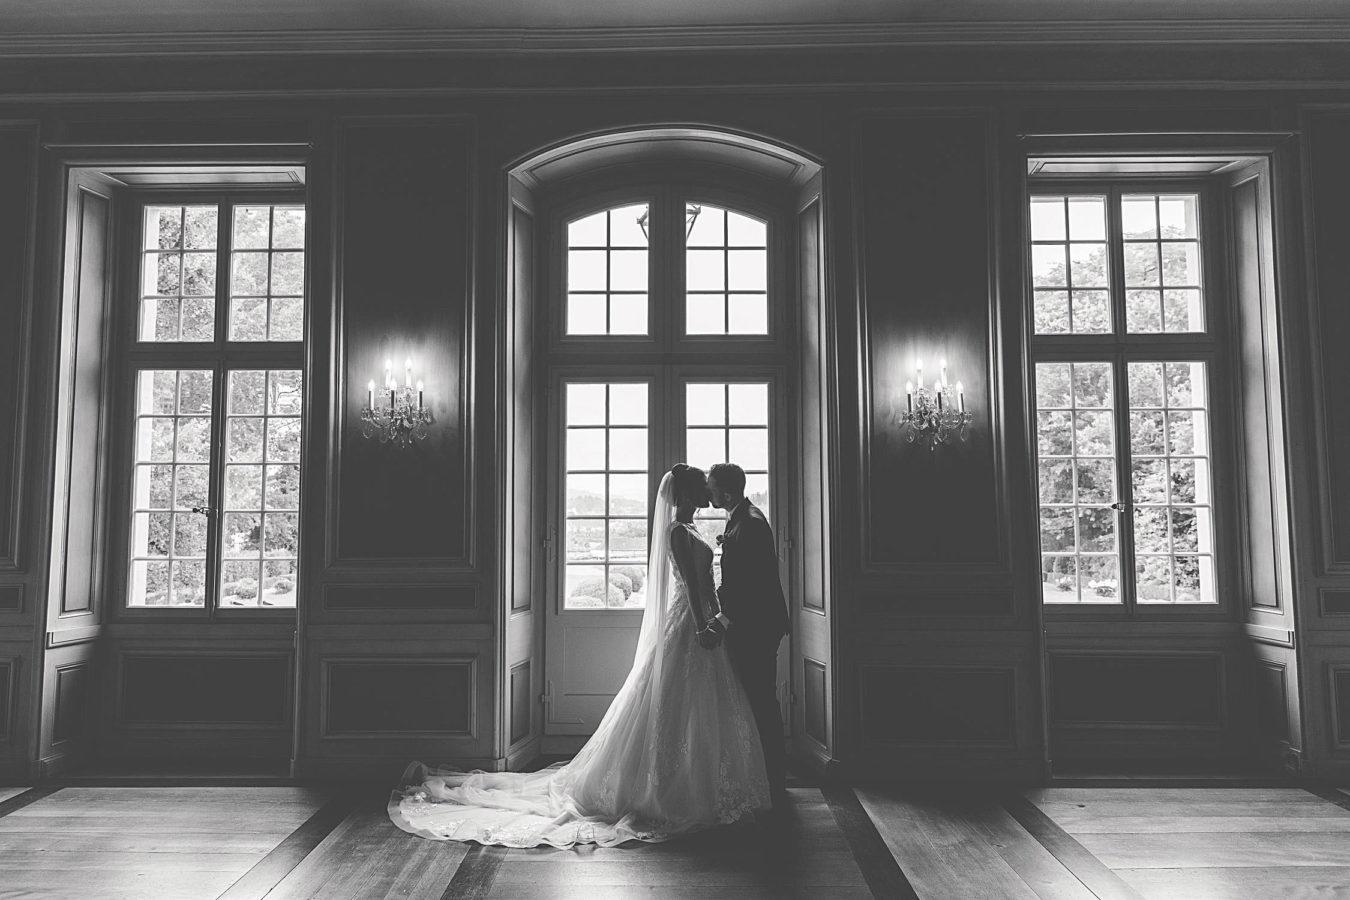 Brautpaarsfotoshooting